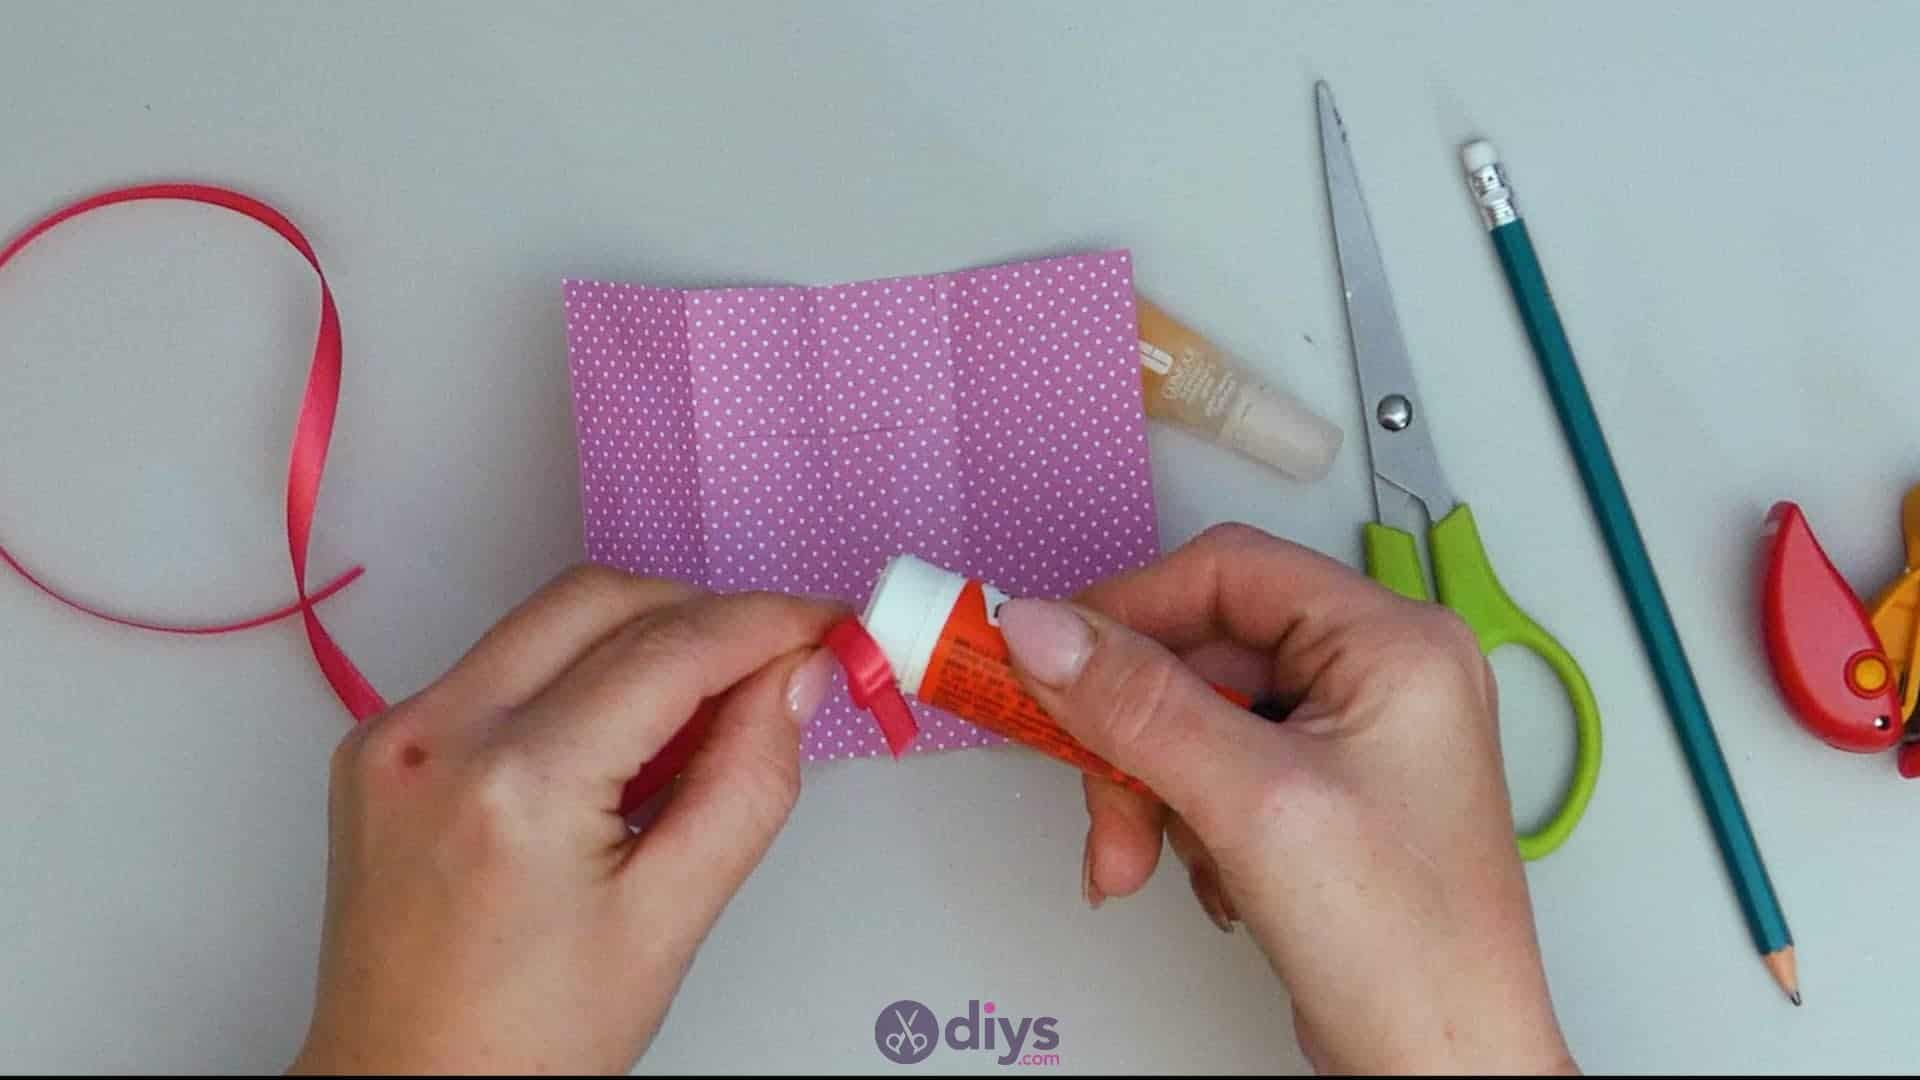 Diy lipstick gift card step 8a